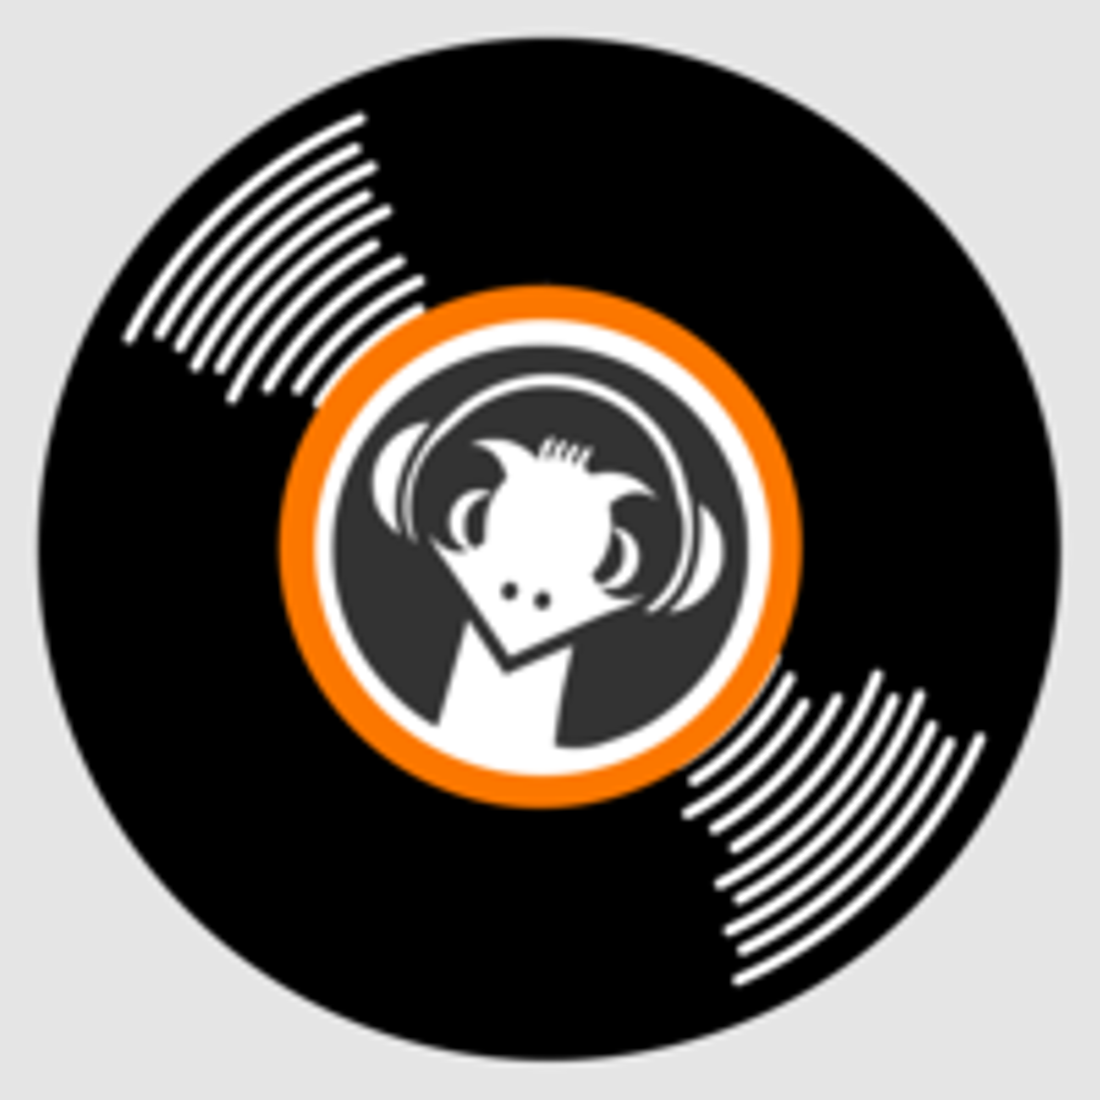 [Aisyk] Gba tracking